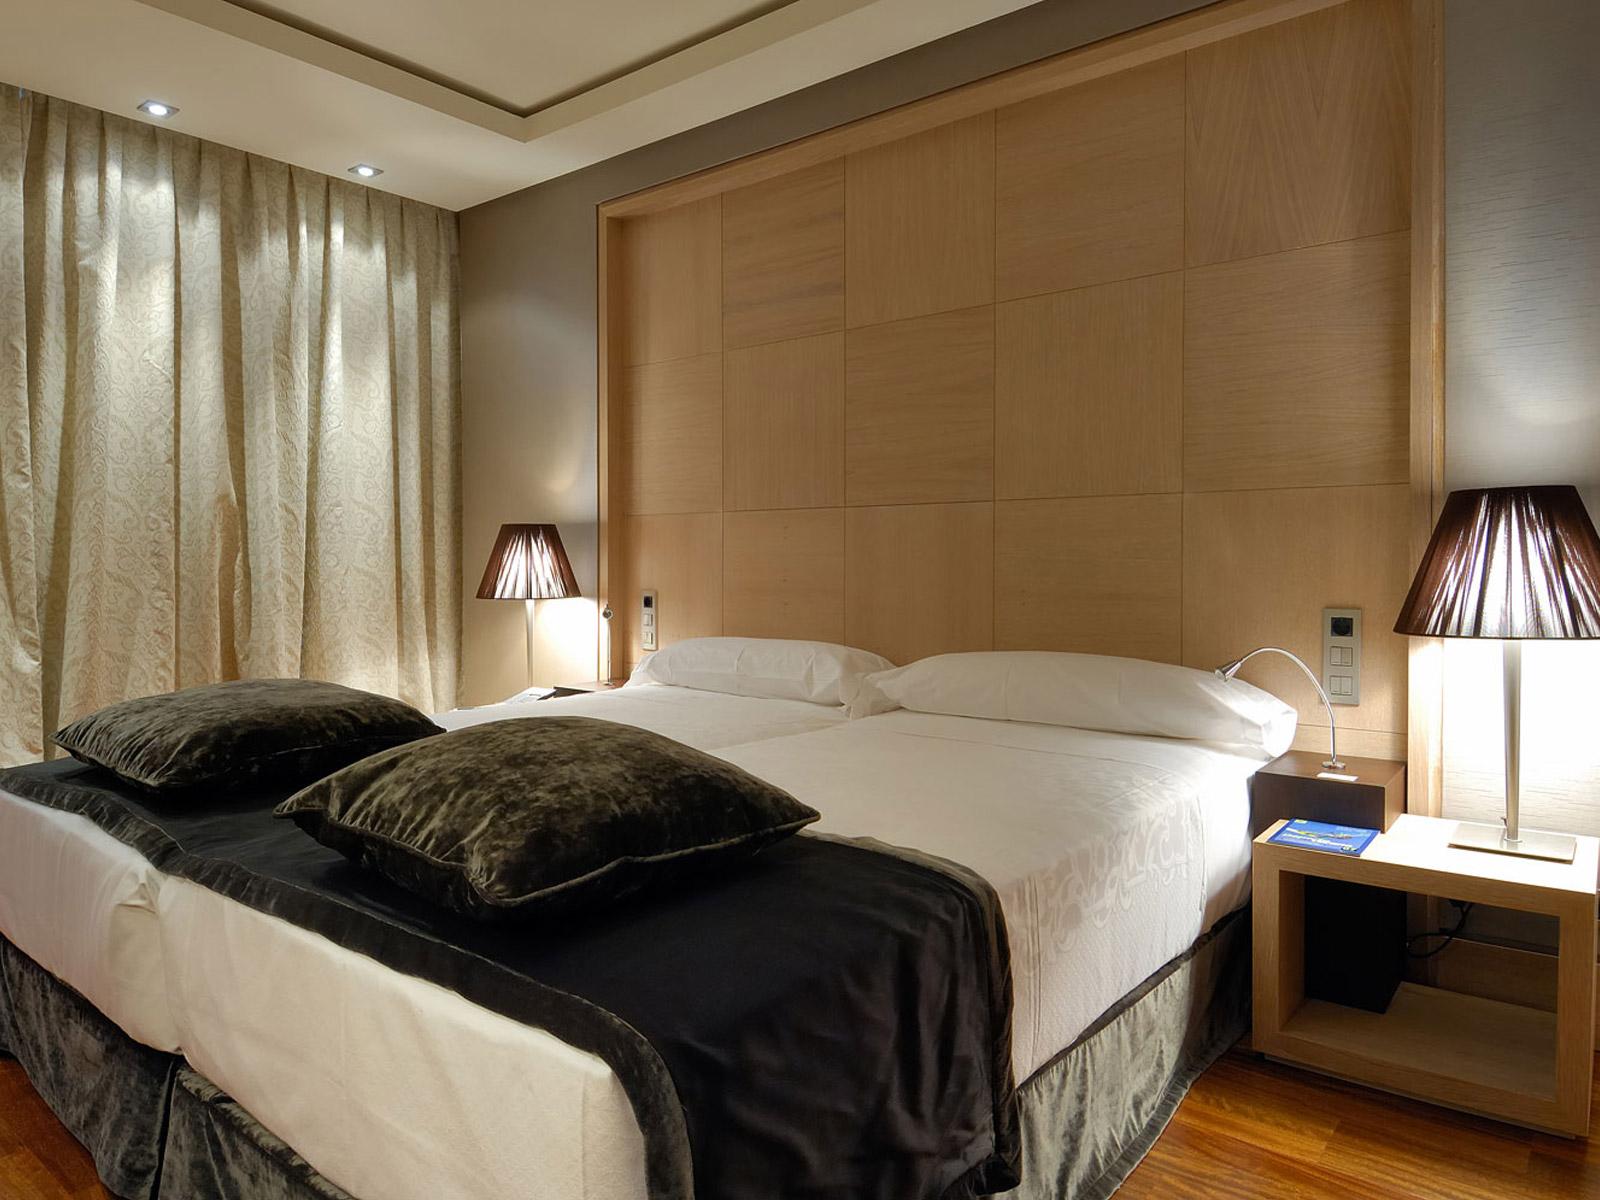 Rooms Hotel Valladolid Frontaura - Vincci Hotels - Standard Room